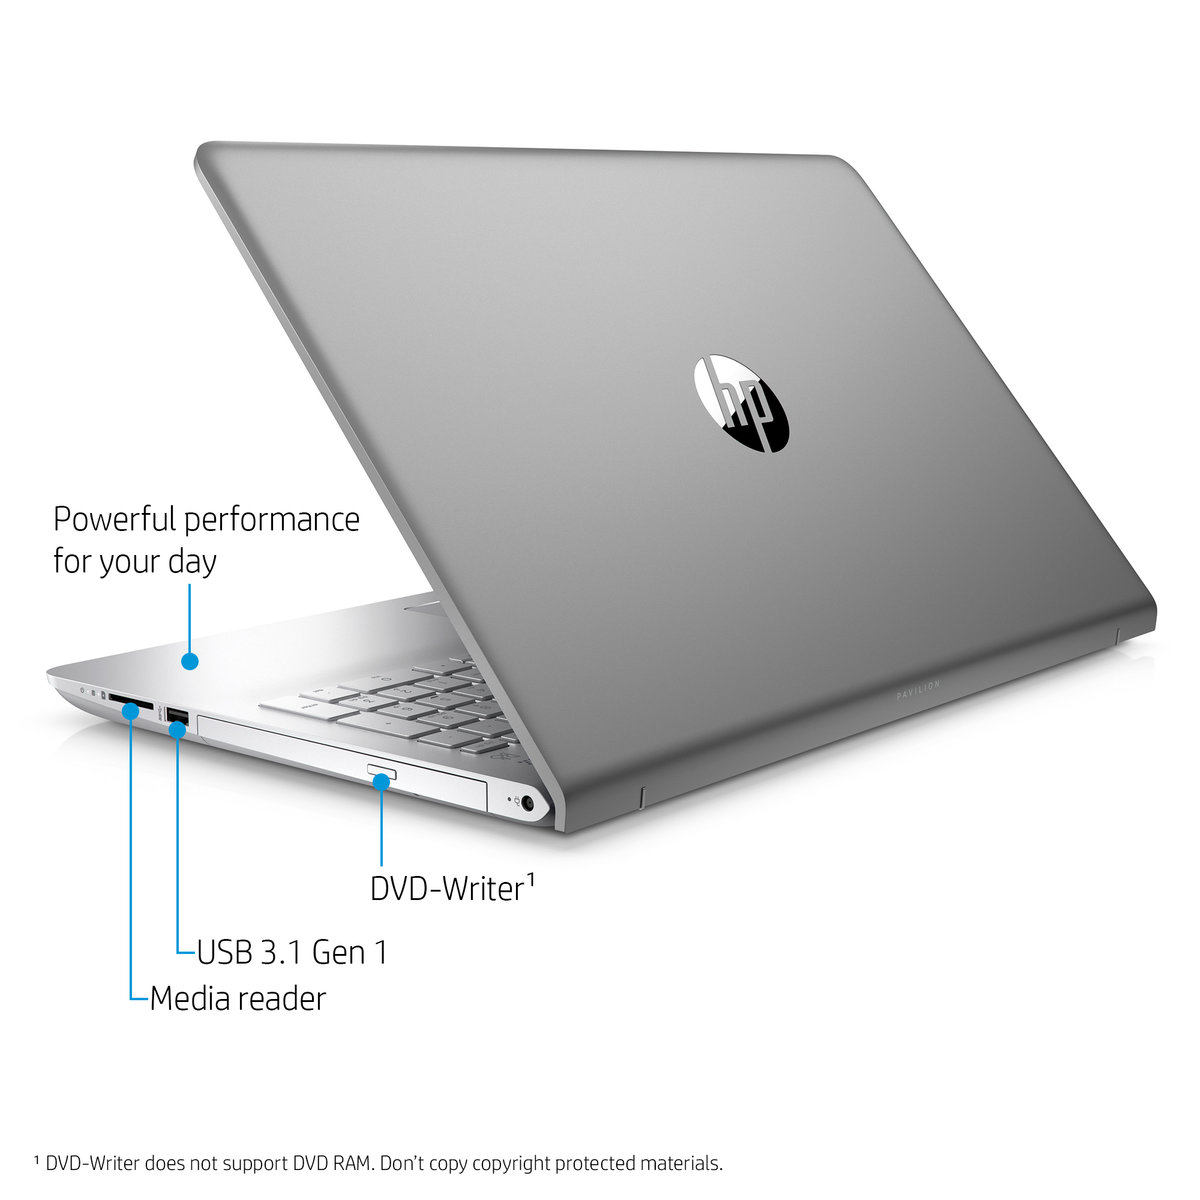 Hp Pavilion Laptop 15 6 Screen 8th Gen Intel Core I5 8gb Memory 1tb